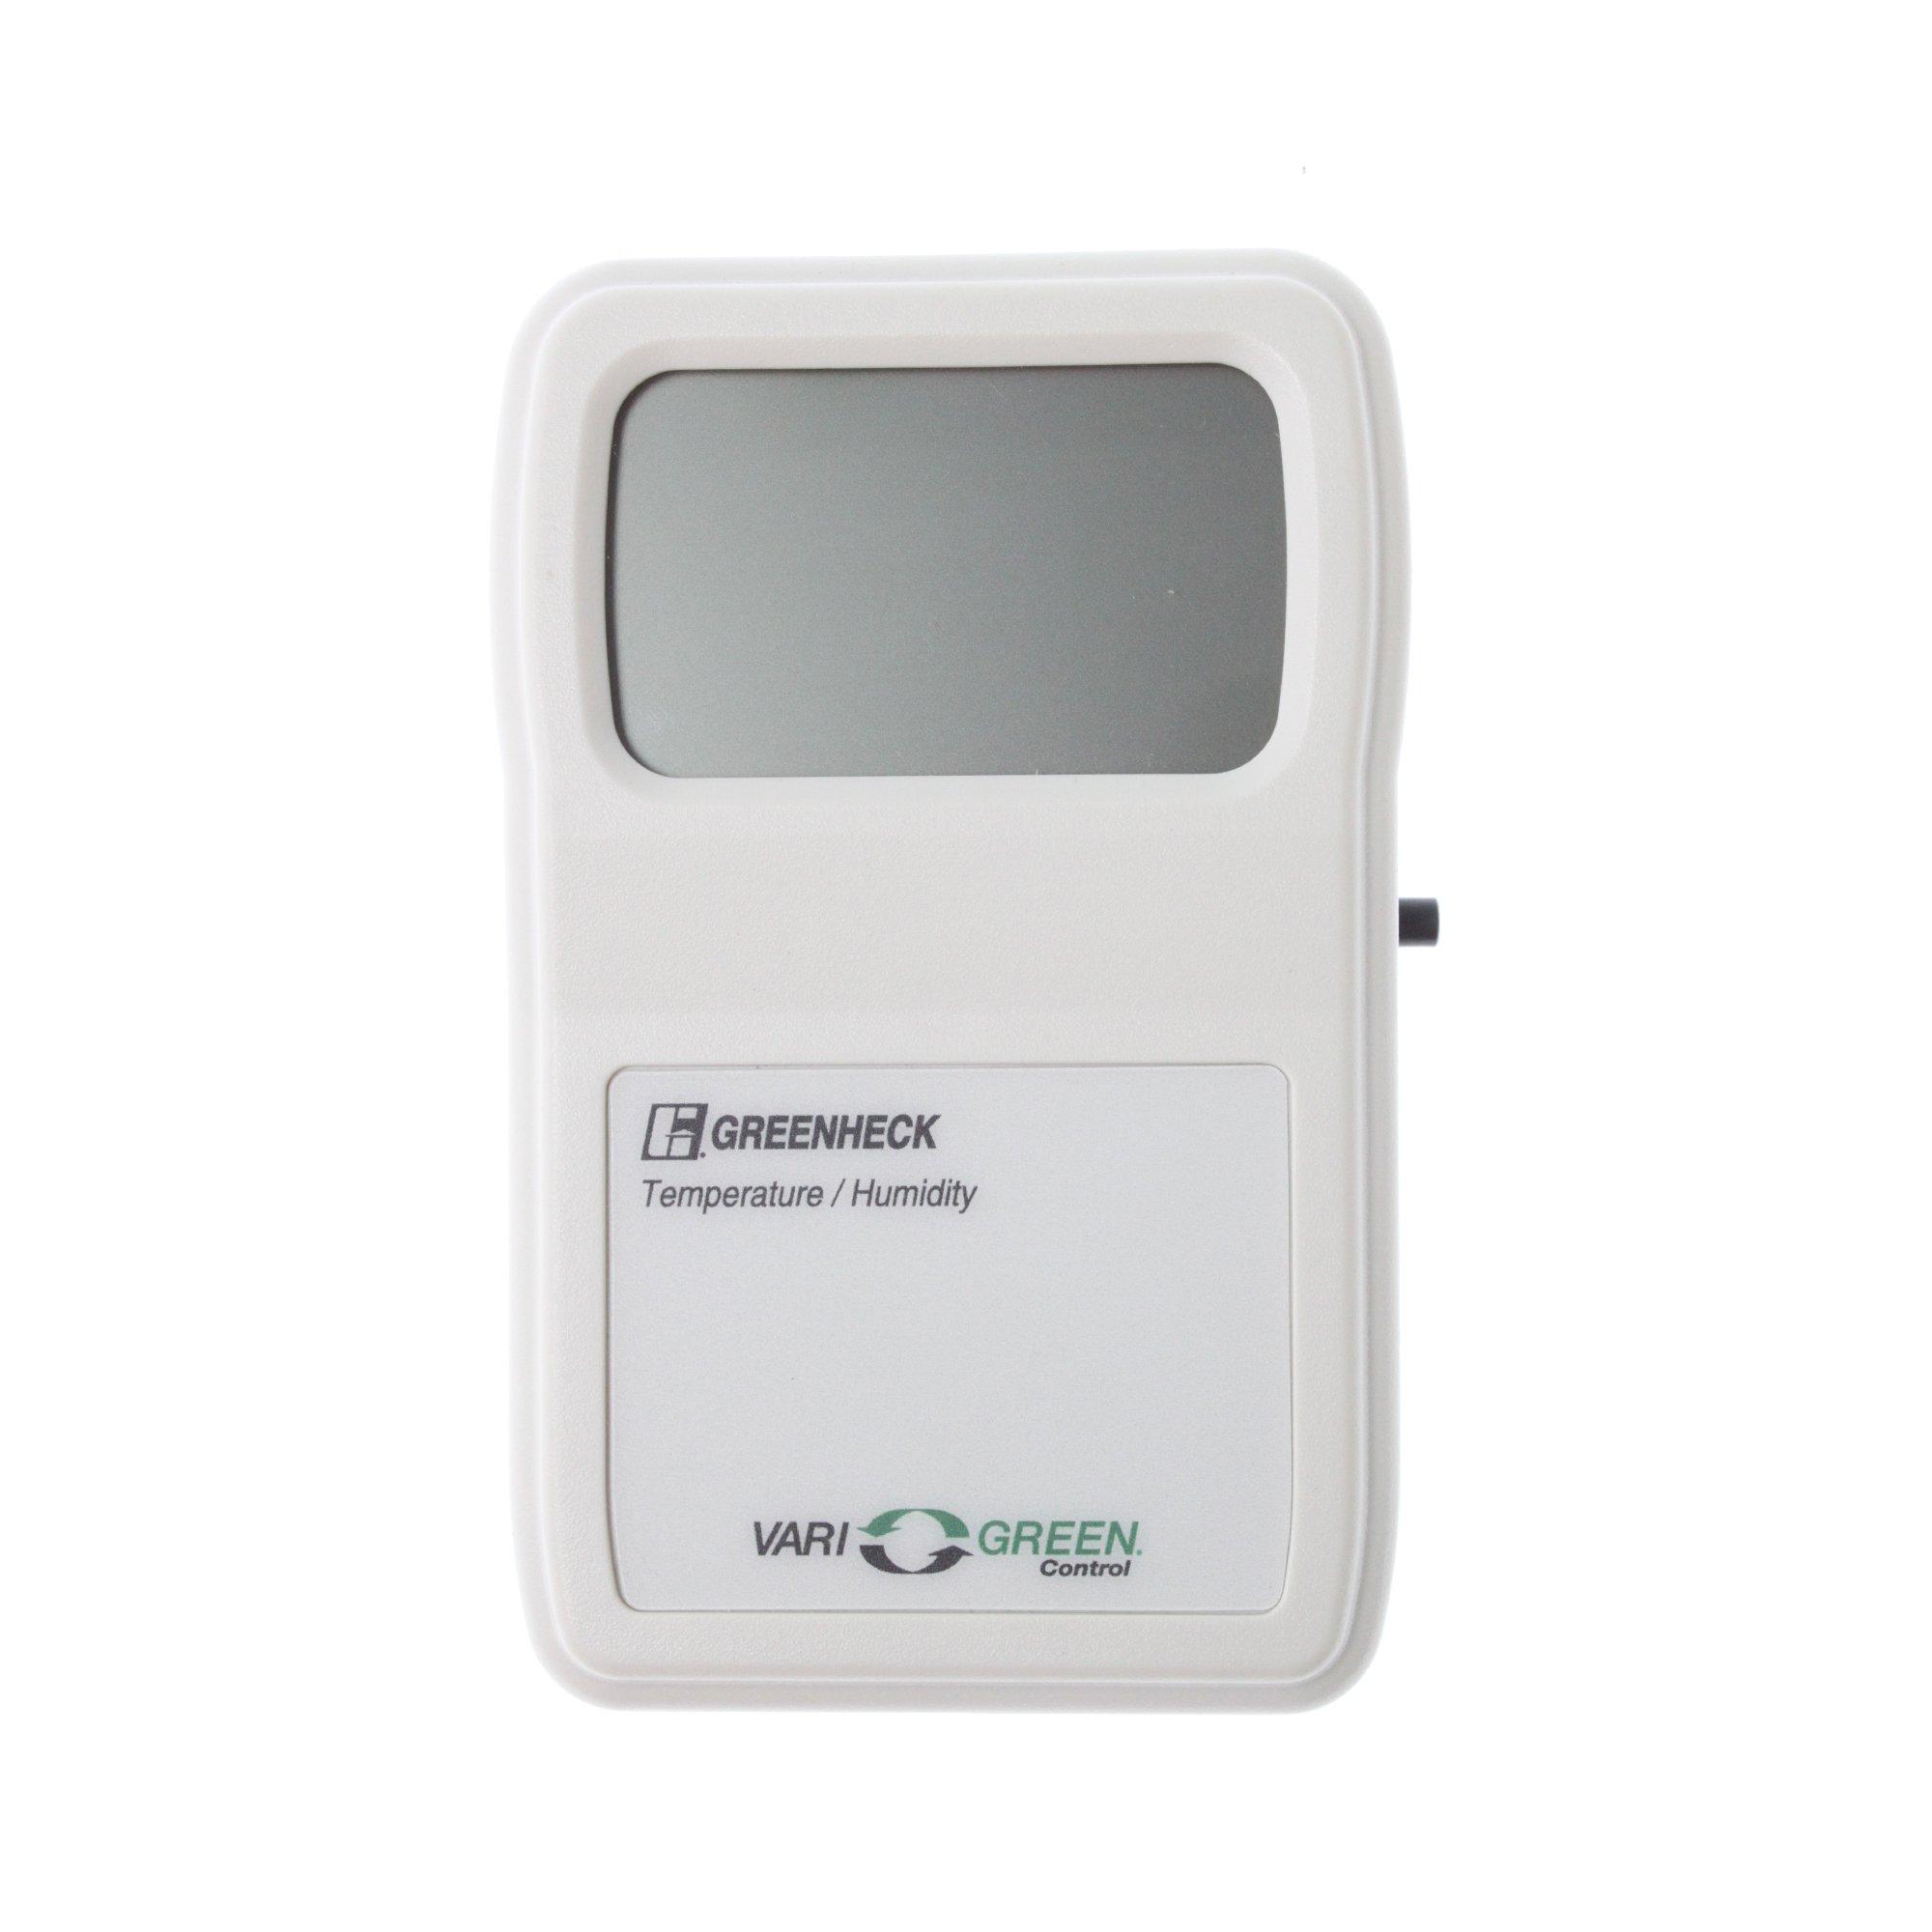 Greenheck 384666 Vari-Green Temperature & Humidity Controller, 12-35Vdc, White